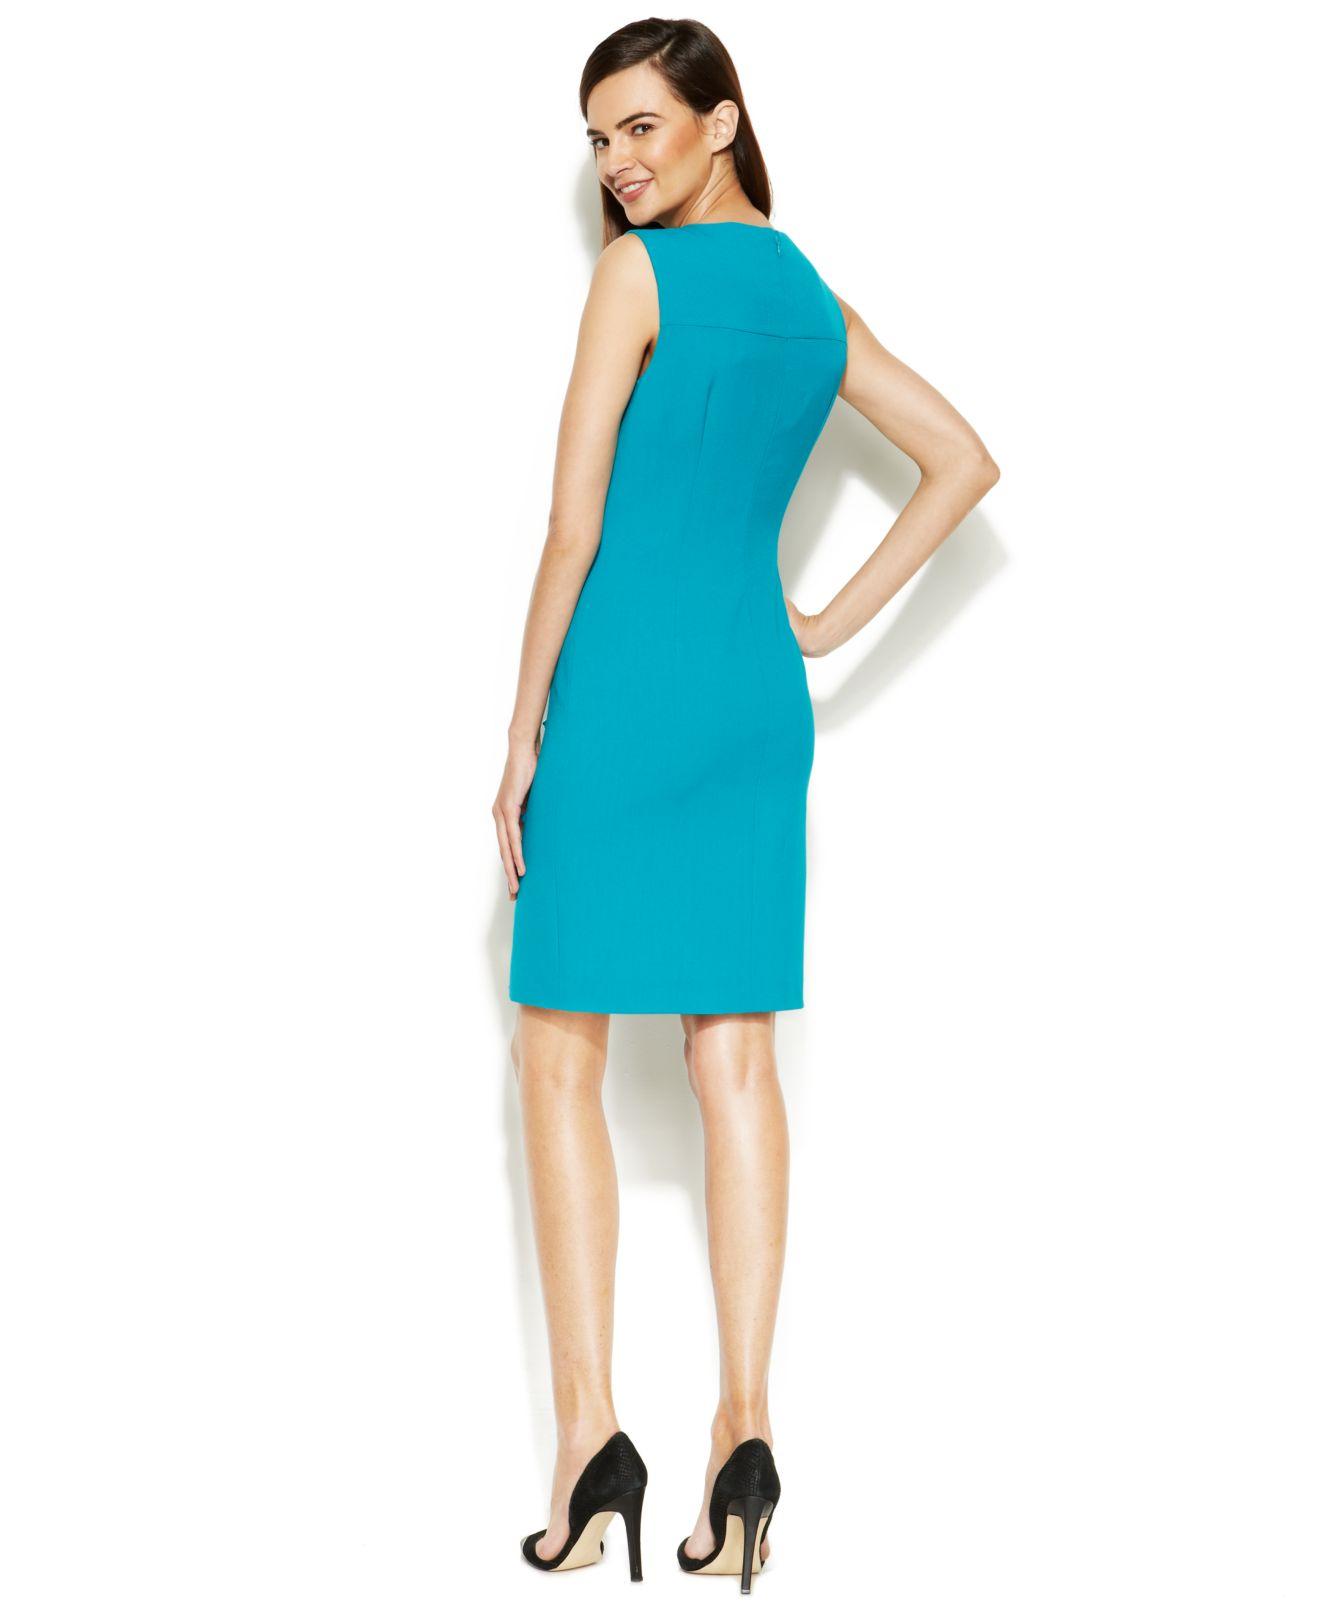 Lyst - Calvin Klein Sleeveless Side-Button Sheath in Green